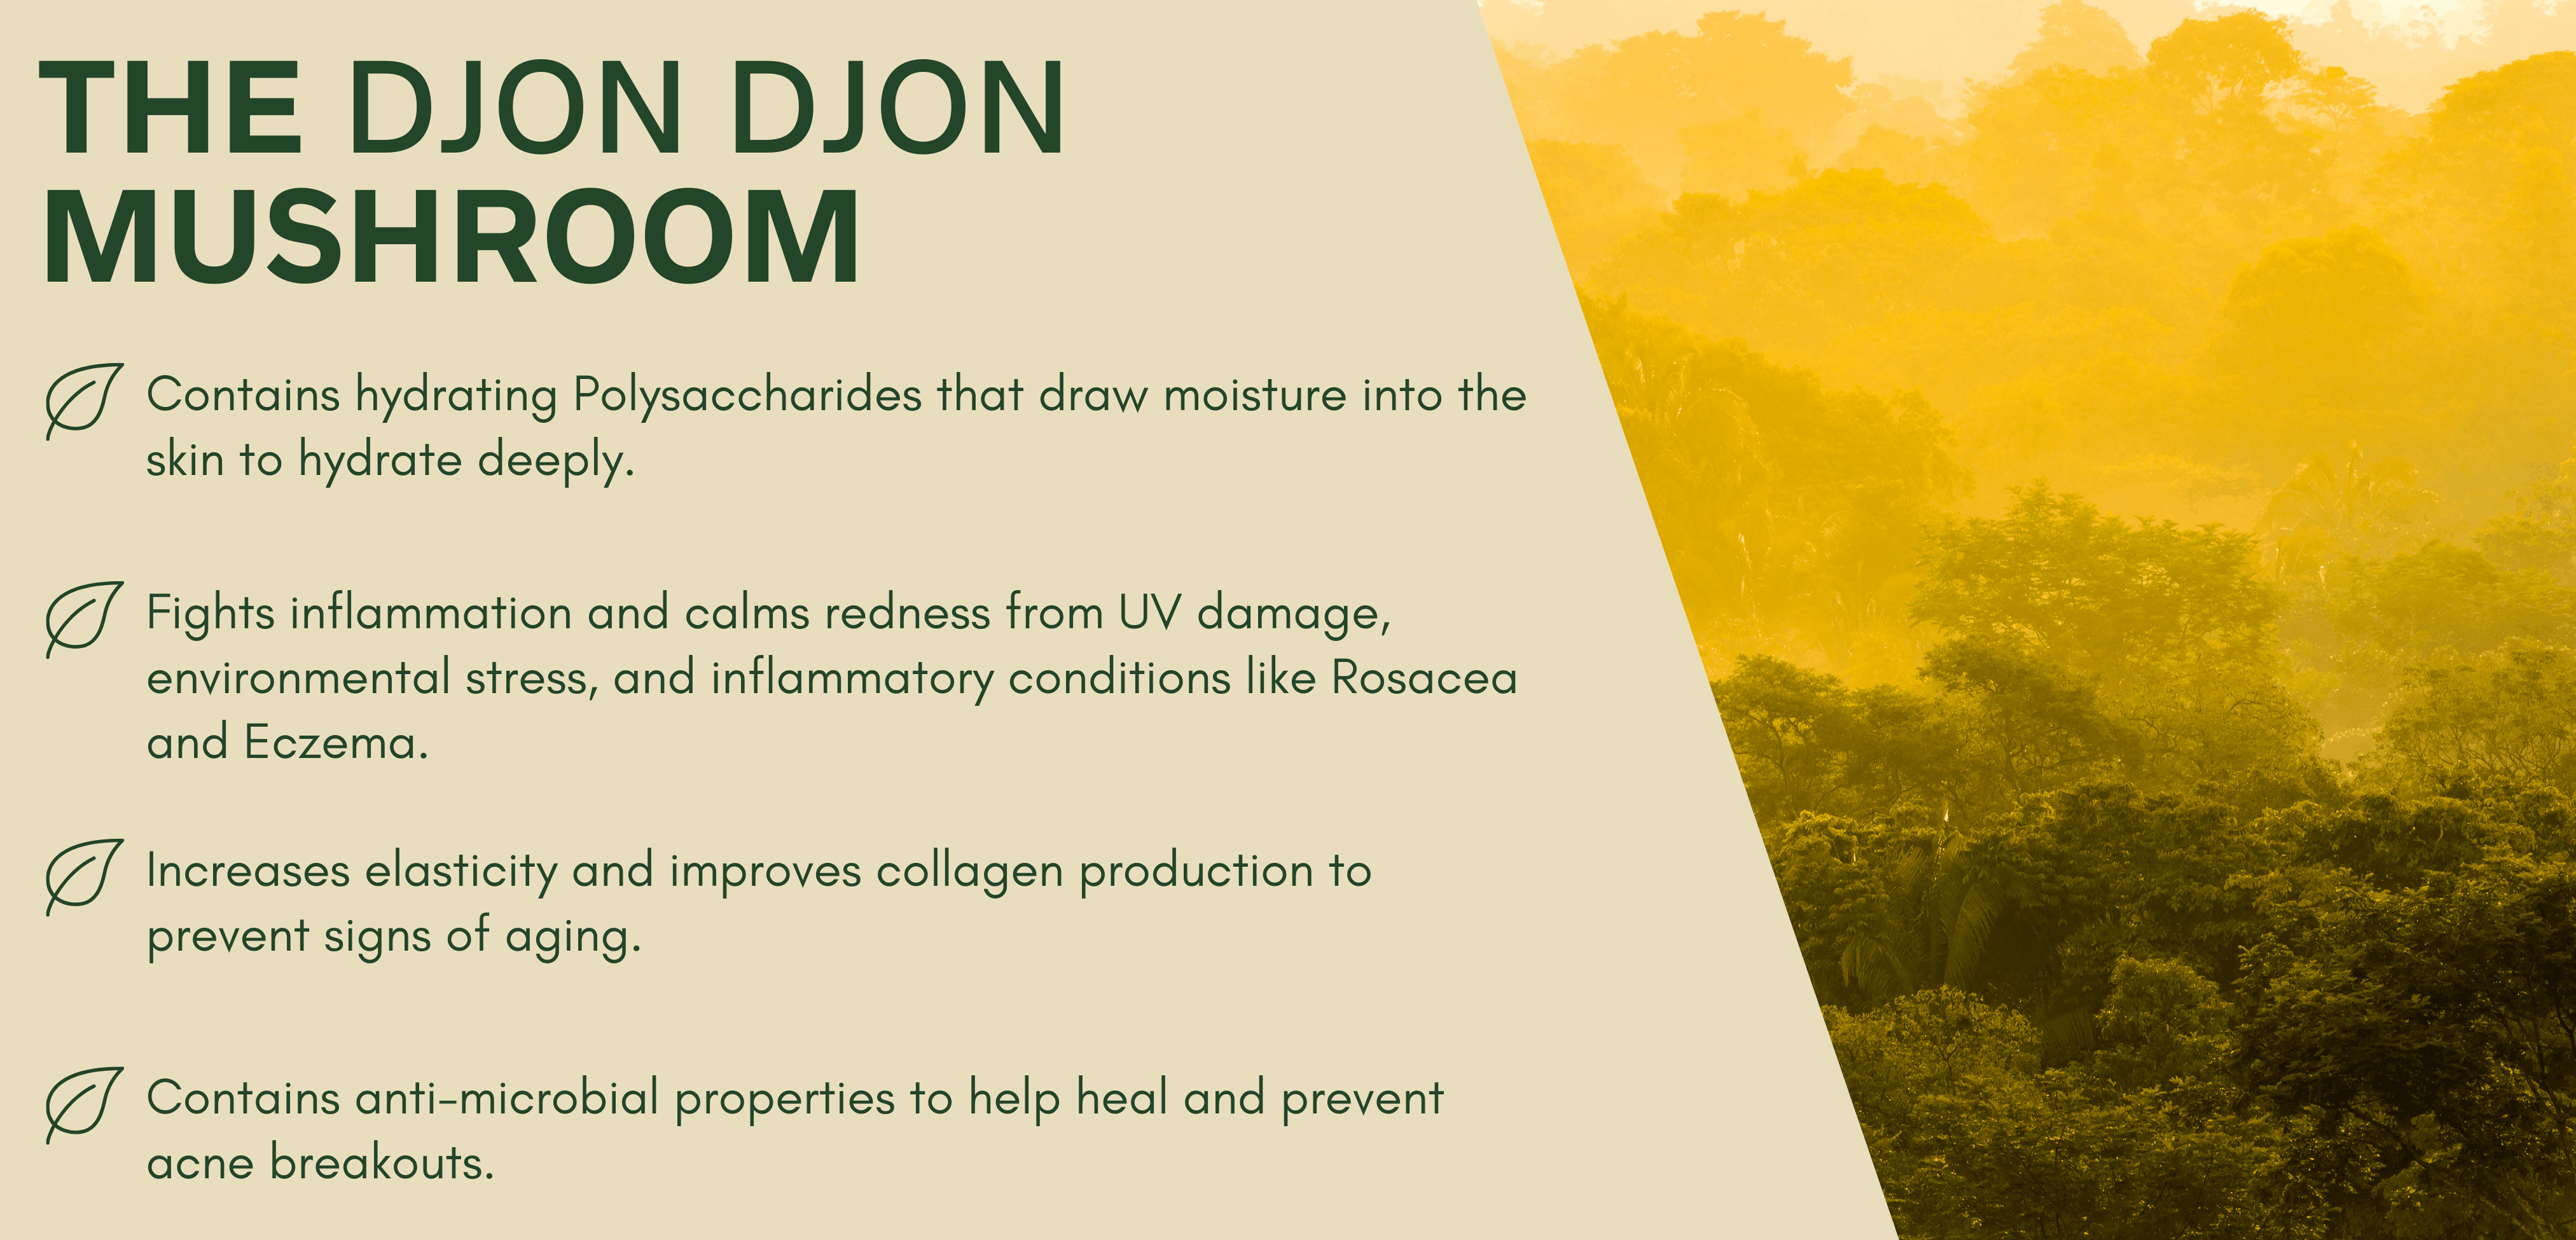 djon djon mushroom benefits